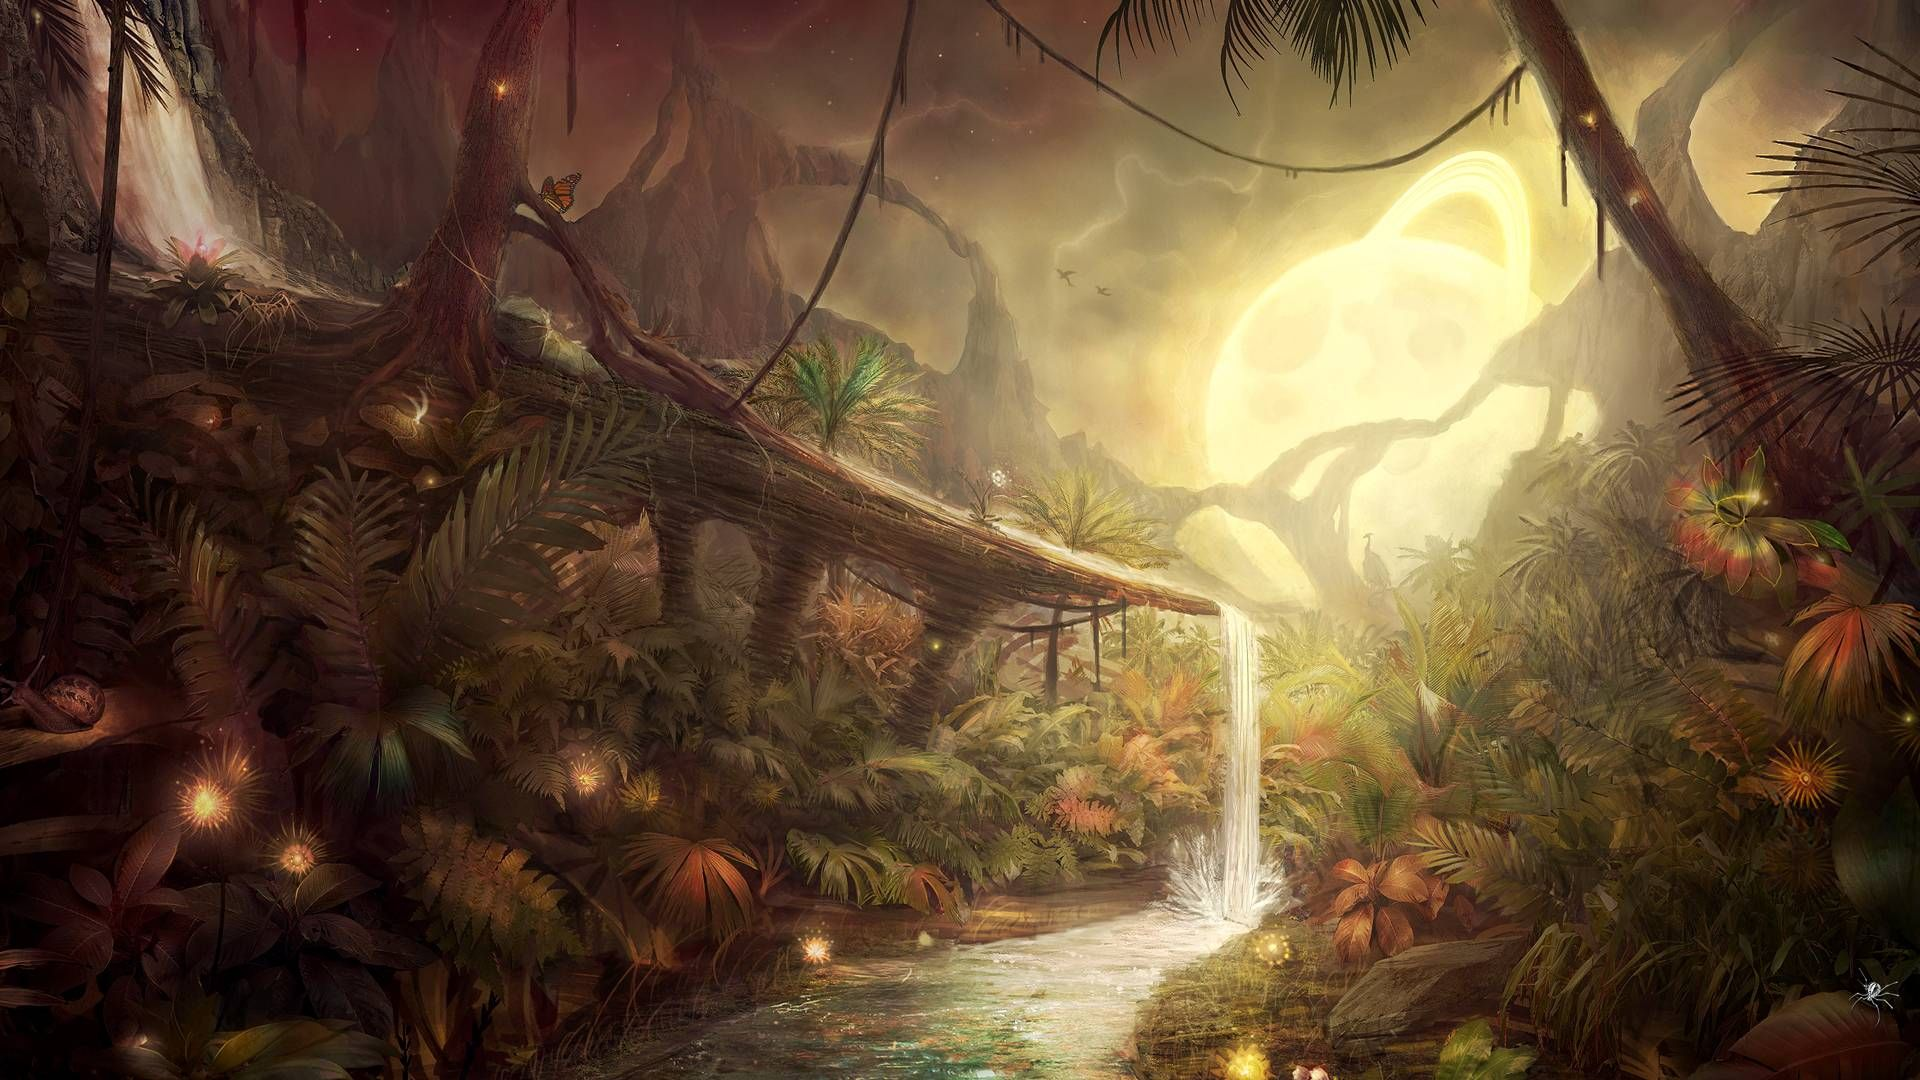 Fantasy art Full HD Wallpaper and Background | 2560x1386 | ID:676334